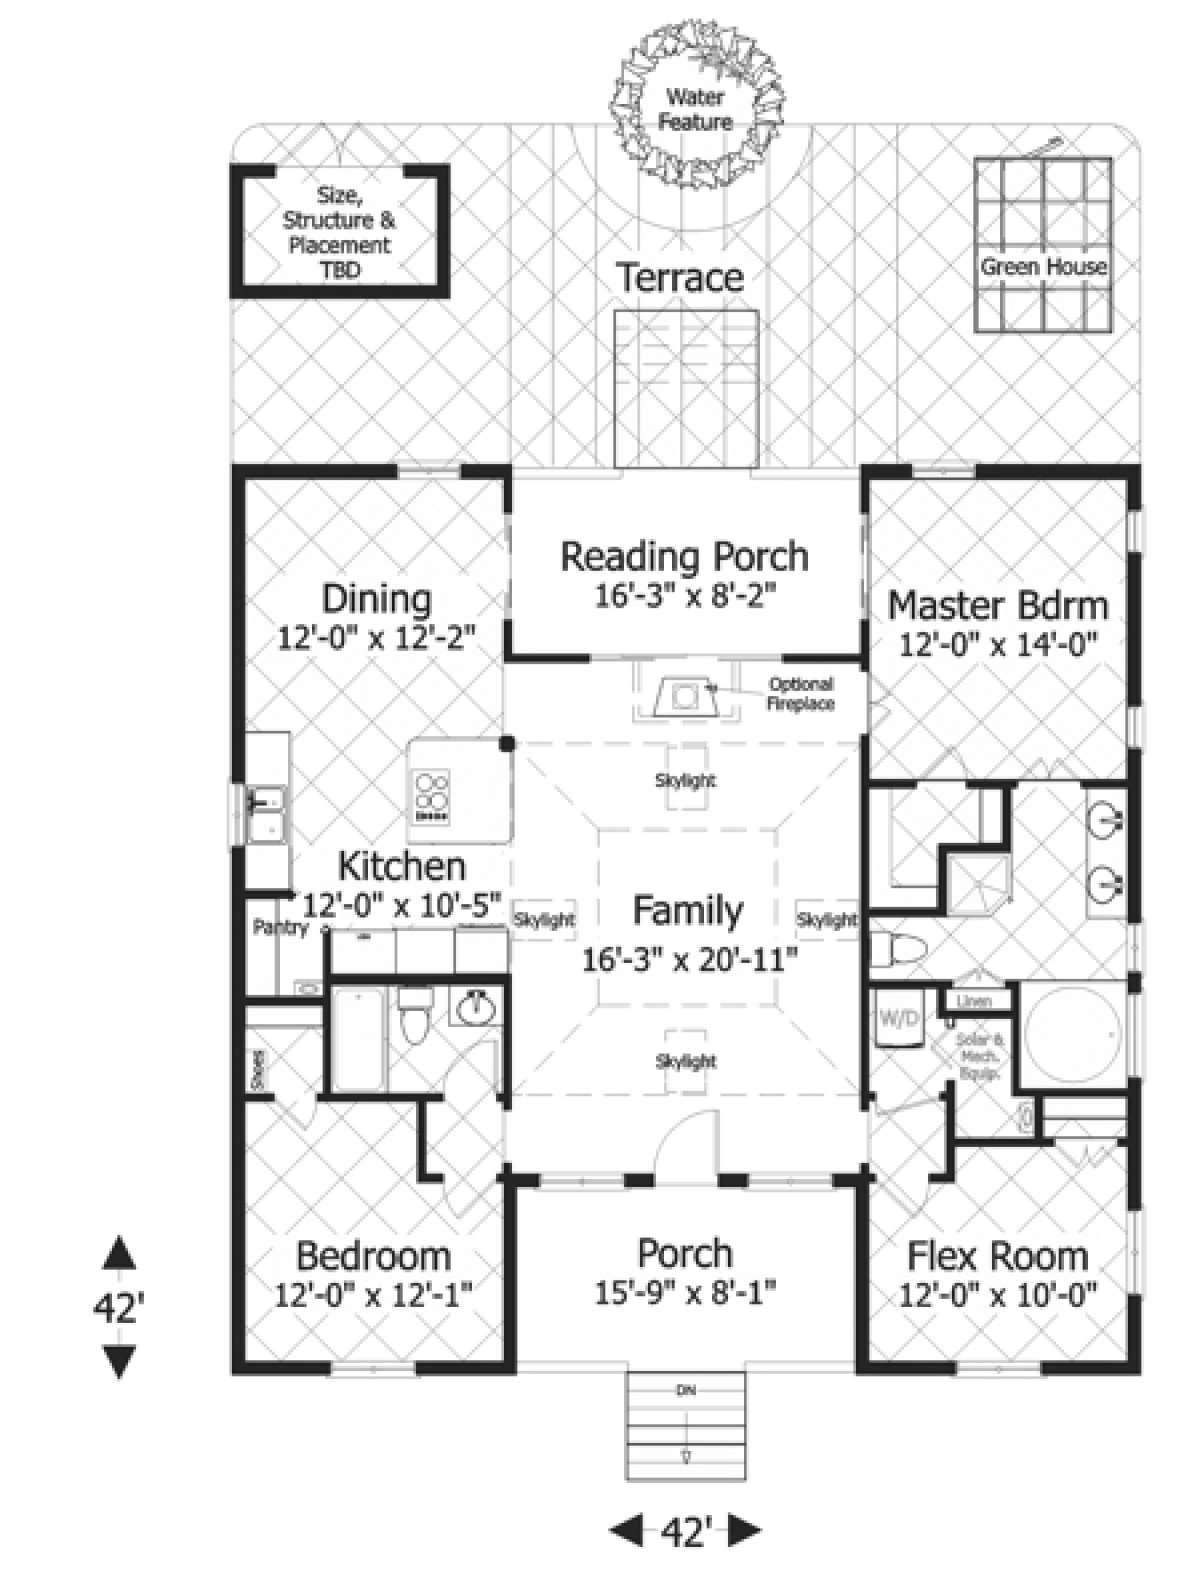 House Plan 036 00177 Bungalow Plan 1 488 Square Feet 3 Bedrooms 2 Bathrooms In 2020 Bungalow Style House Plans House Floor Plans House Plans